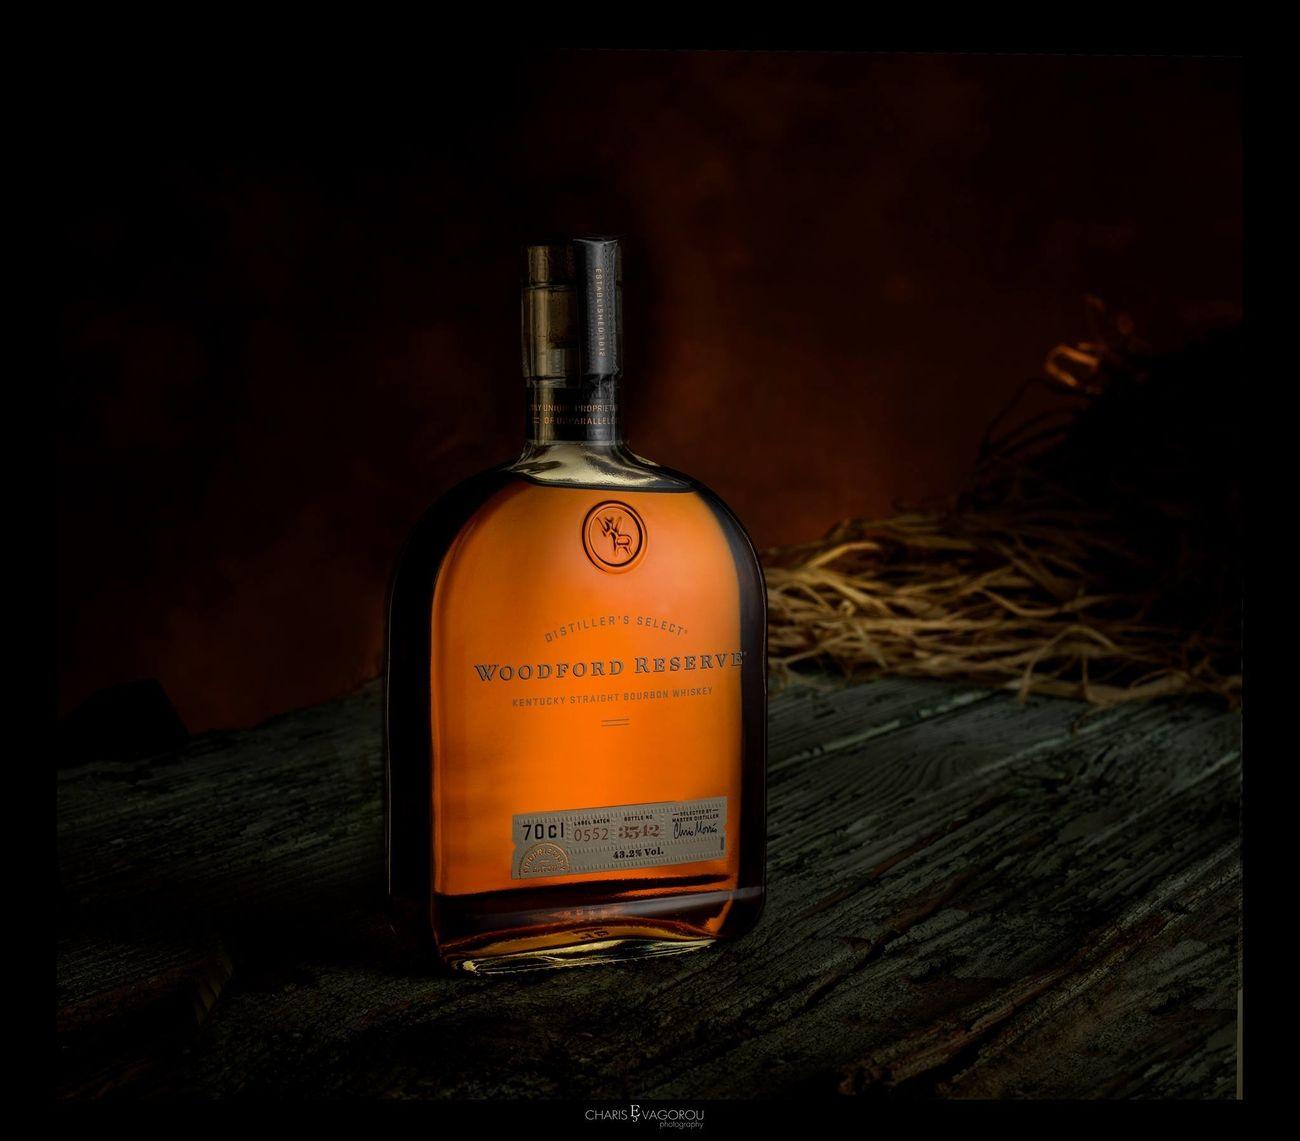 Photography: Charis Evagorou Woodford Reserve  #woodfordreserve #bourbon #whiskey #cocktails #bartender #kentucky #cocktail #whisky #mixology #oldfashioned #bar #drinks #sunset #louisville #jackdaniels  #scotch #bartenderlife #oldforester  #tennessee #fourroses #kentuckybourbon  #jimbeam #traditional #christmas #winterwarmers #tistheseason #bhfyp